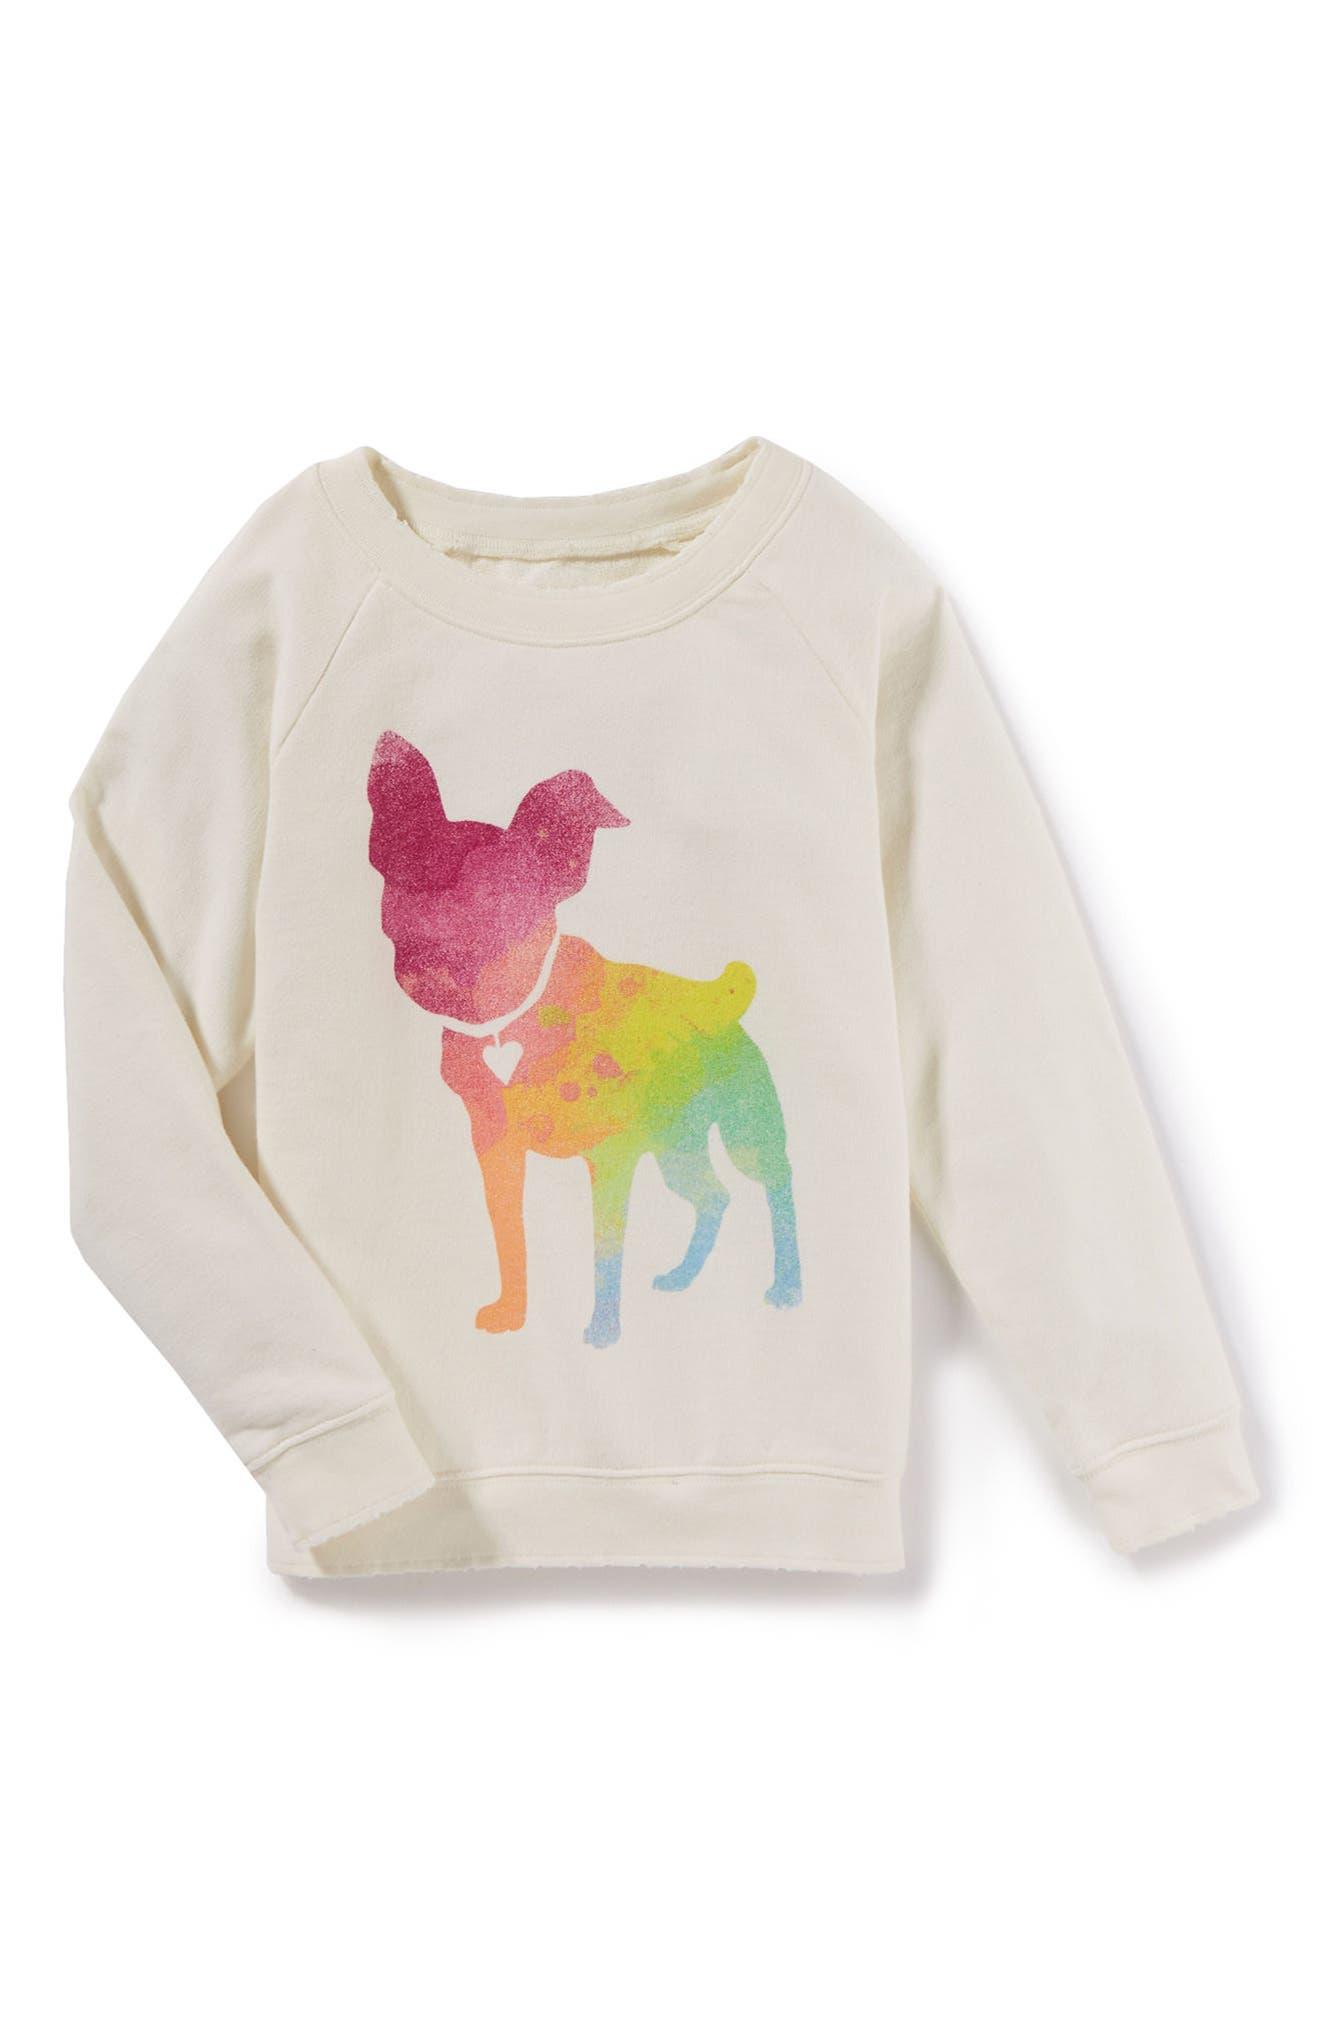 Main Image - Peek Colette Graphic Sweatshirt (Toddler Girls, Little Girls & Big Girls)